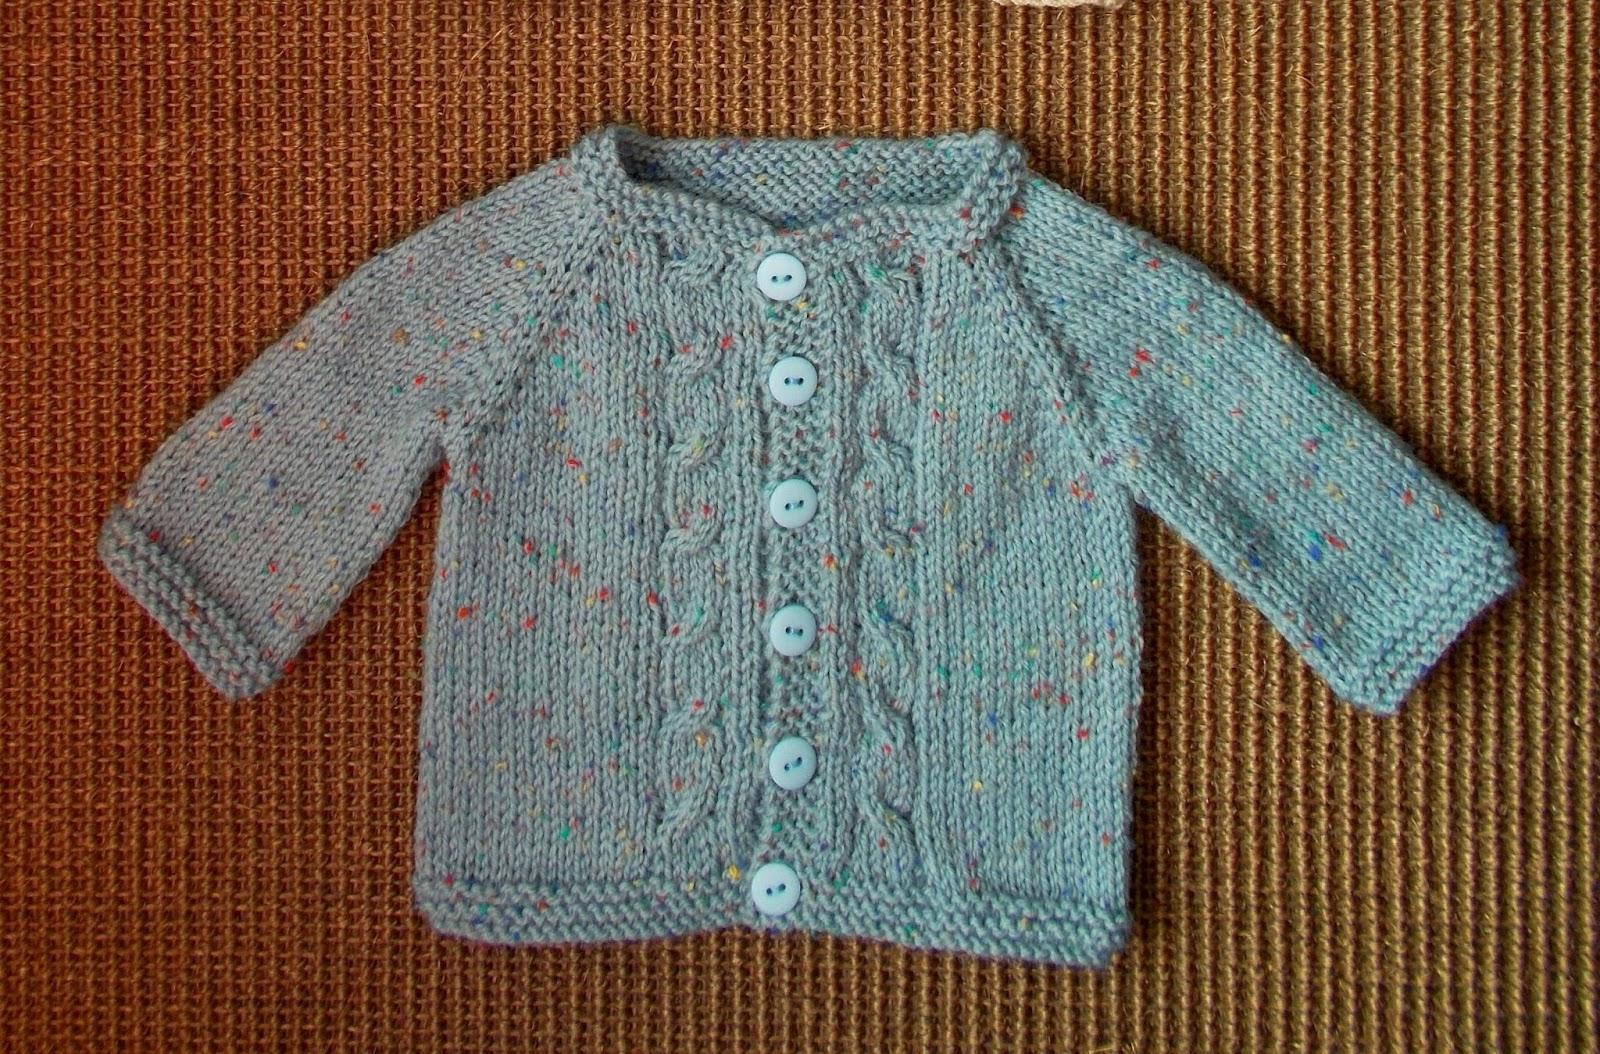 Knitting Stitches For Baby Sweaters : mariannas lazy daisy days: Max Baby Cardigan Jacket - with eyelet raglan...